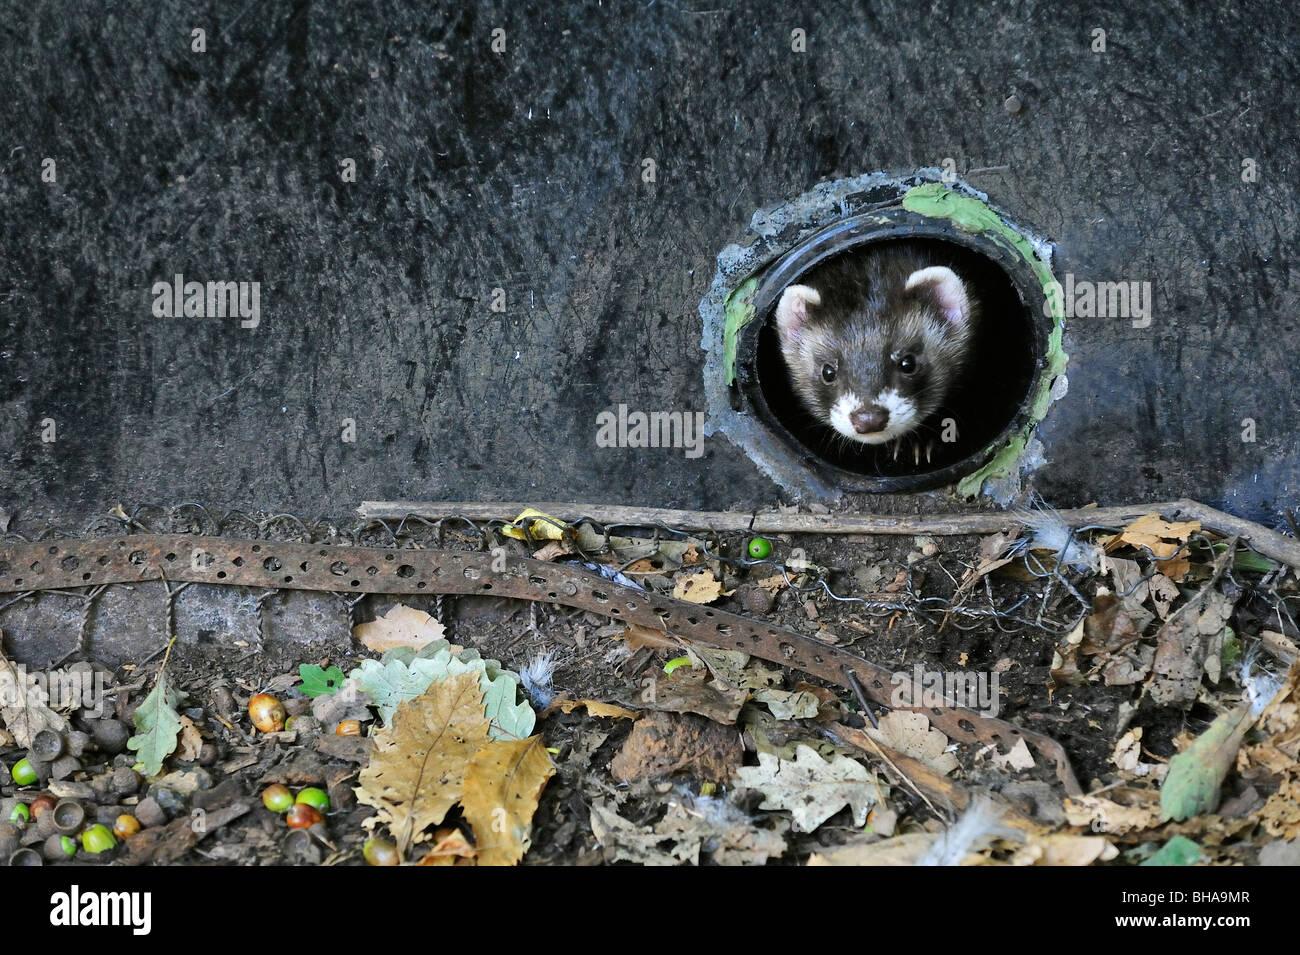 European polecat (Mustela putorius) emerging from drainpipe, UK - Stock Image